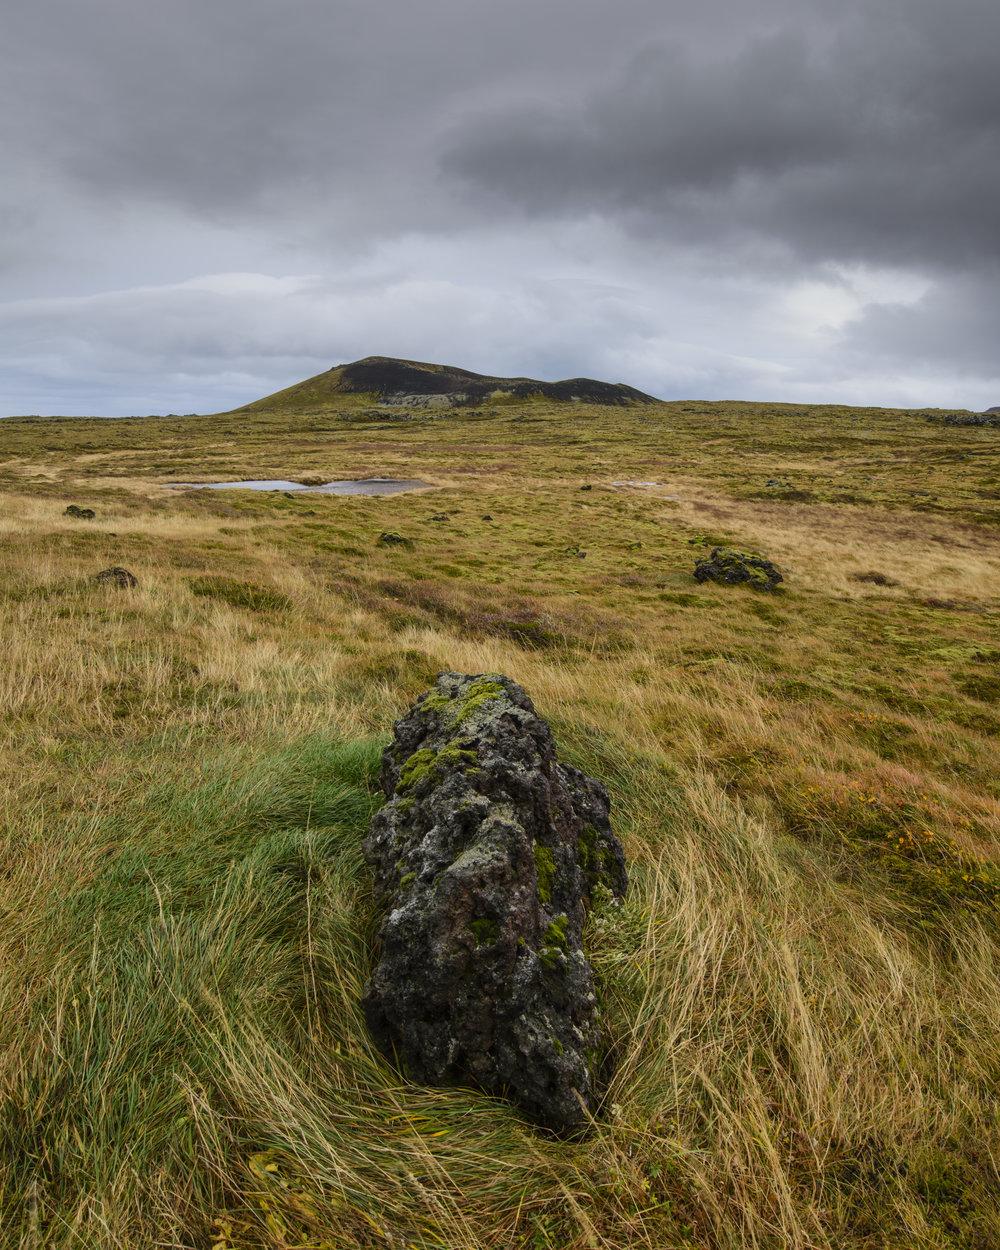 Grass covered lava field, Snaefellsness Peninsula